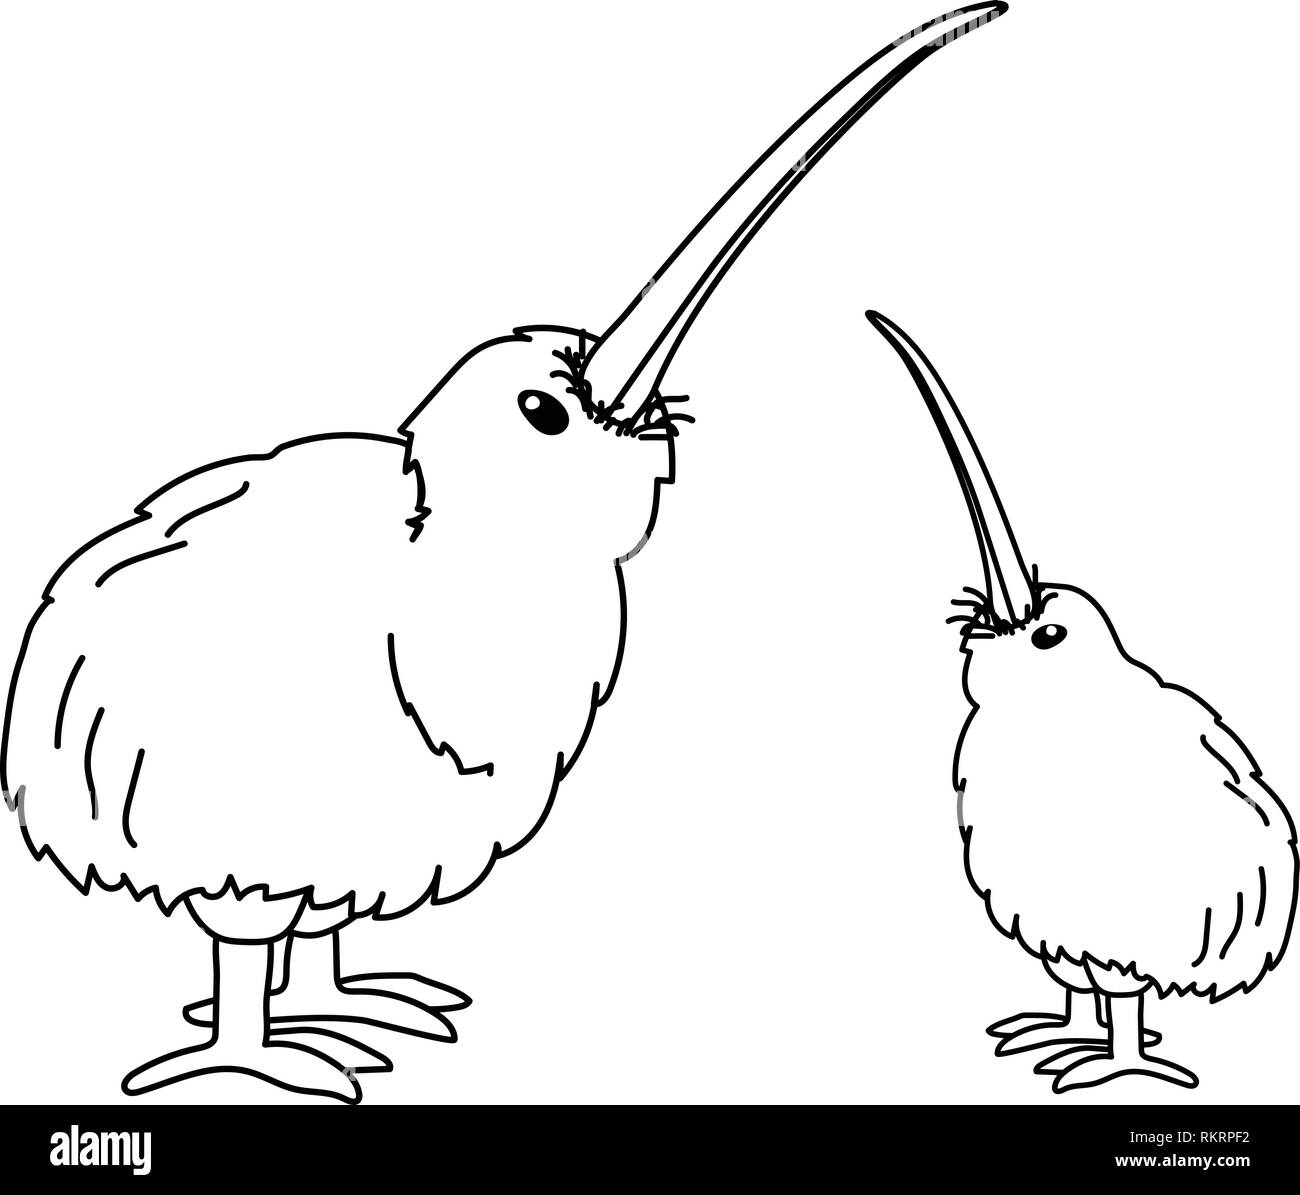 vector cartoon animal clipart wingless kiwi bird - Stock Image